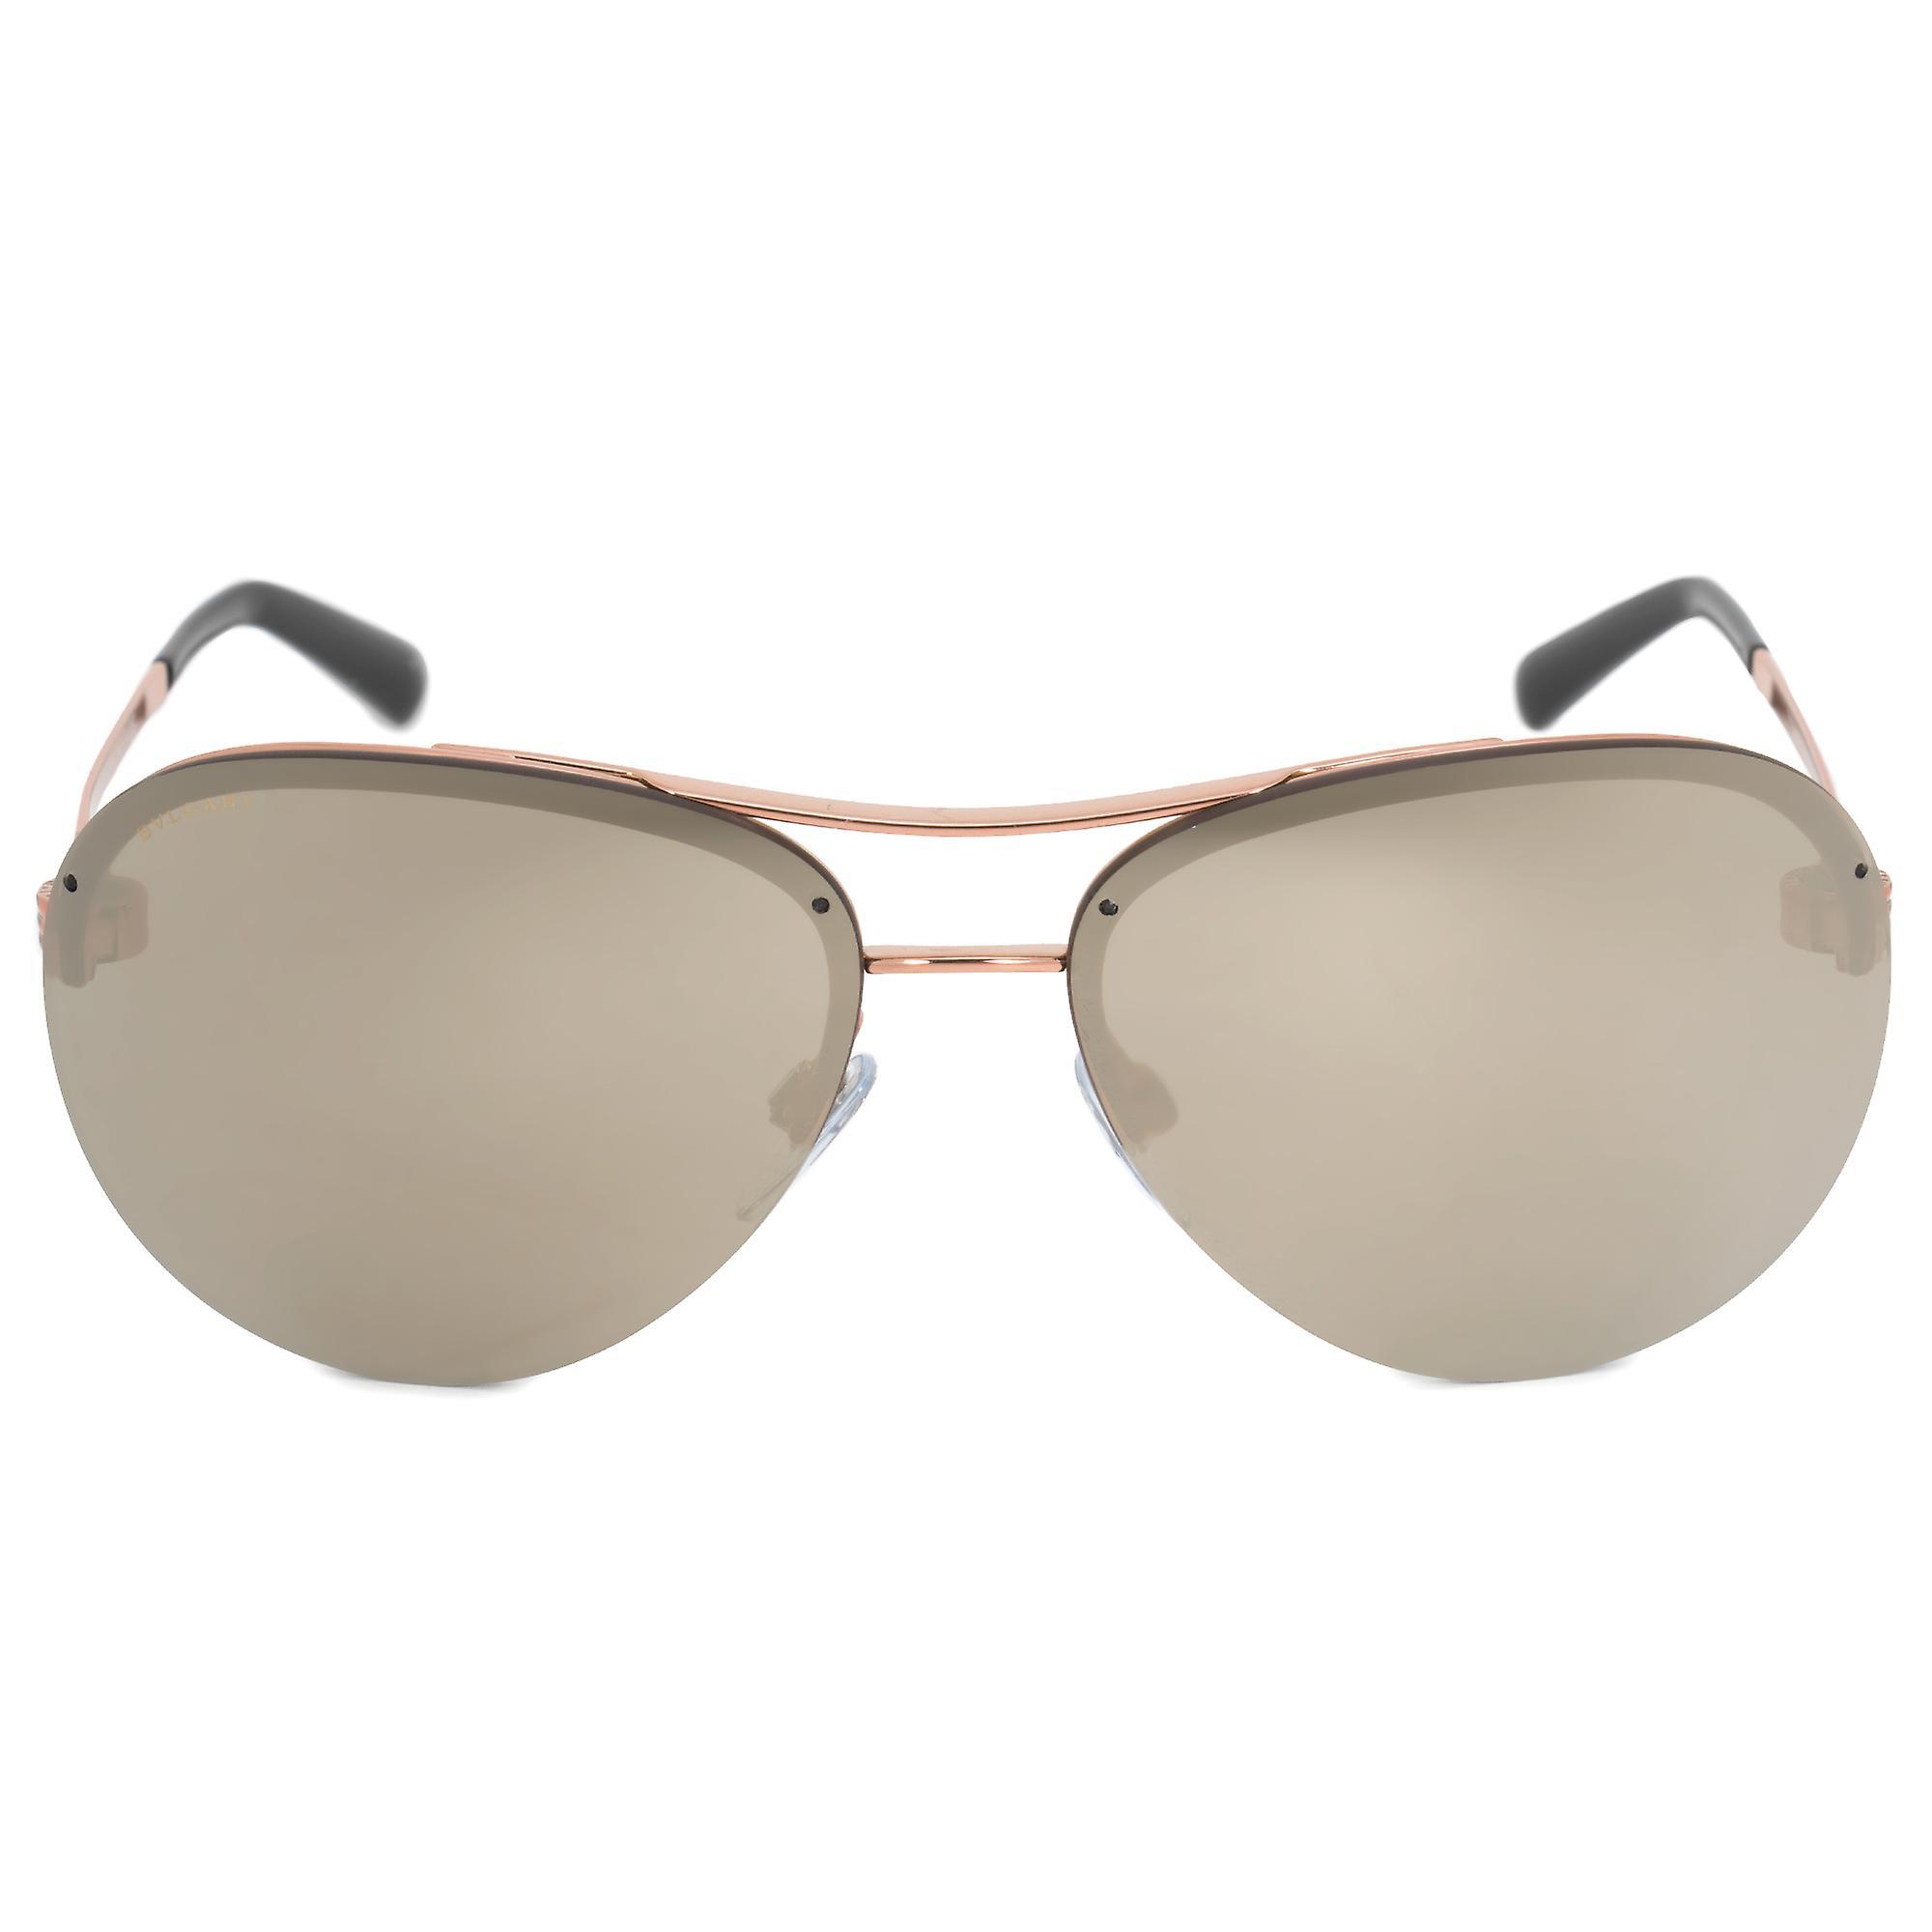 2ed2bc7ec2 Bvlgari Bvlgari Aviator Sunglasses BV6081 376 5A 61